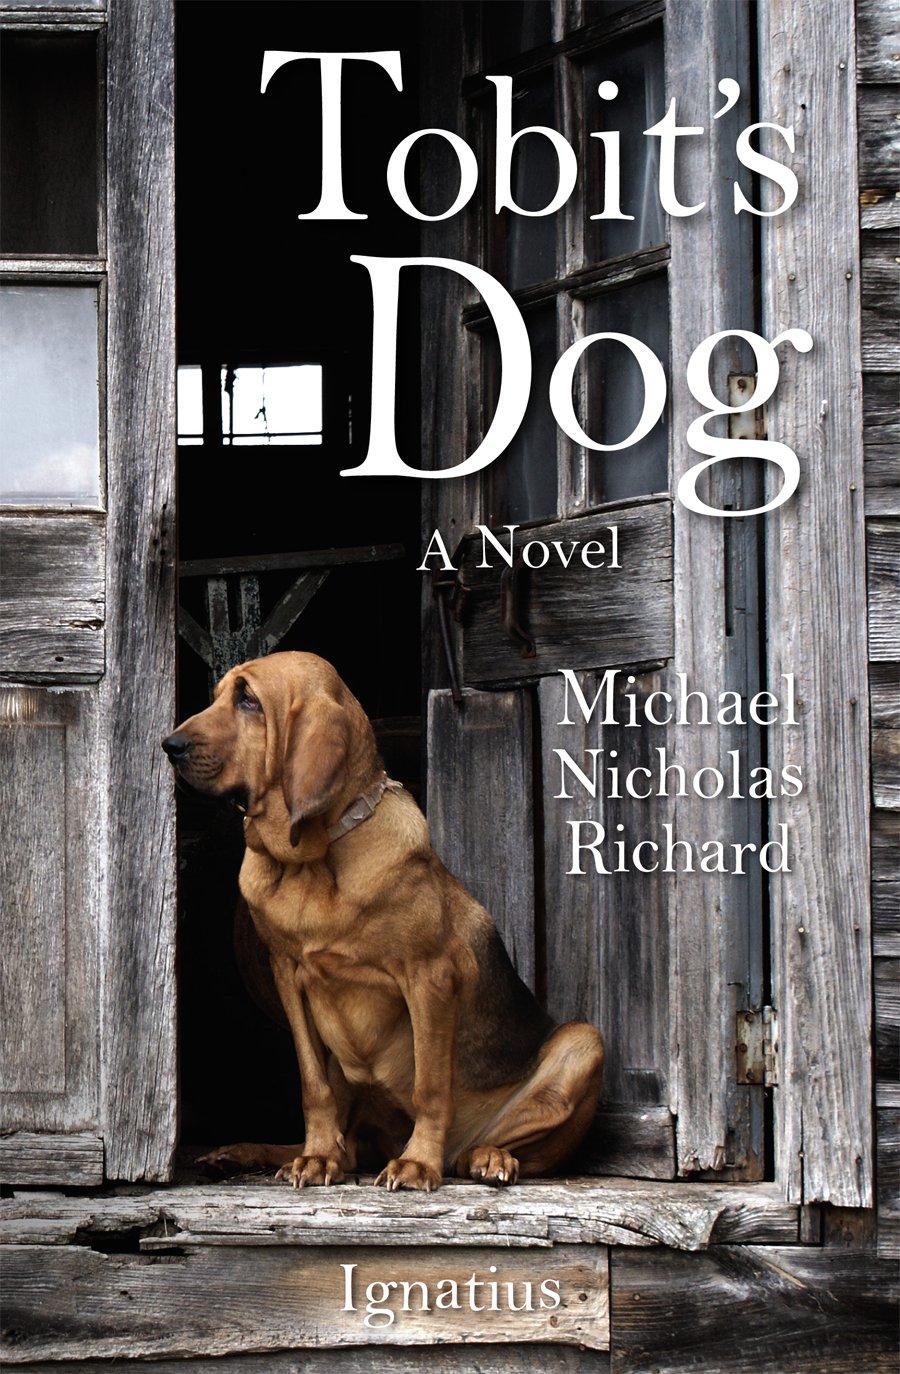 Summer Reading: Tobit's Dog